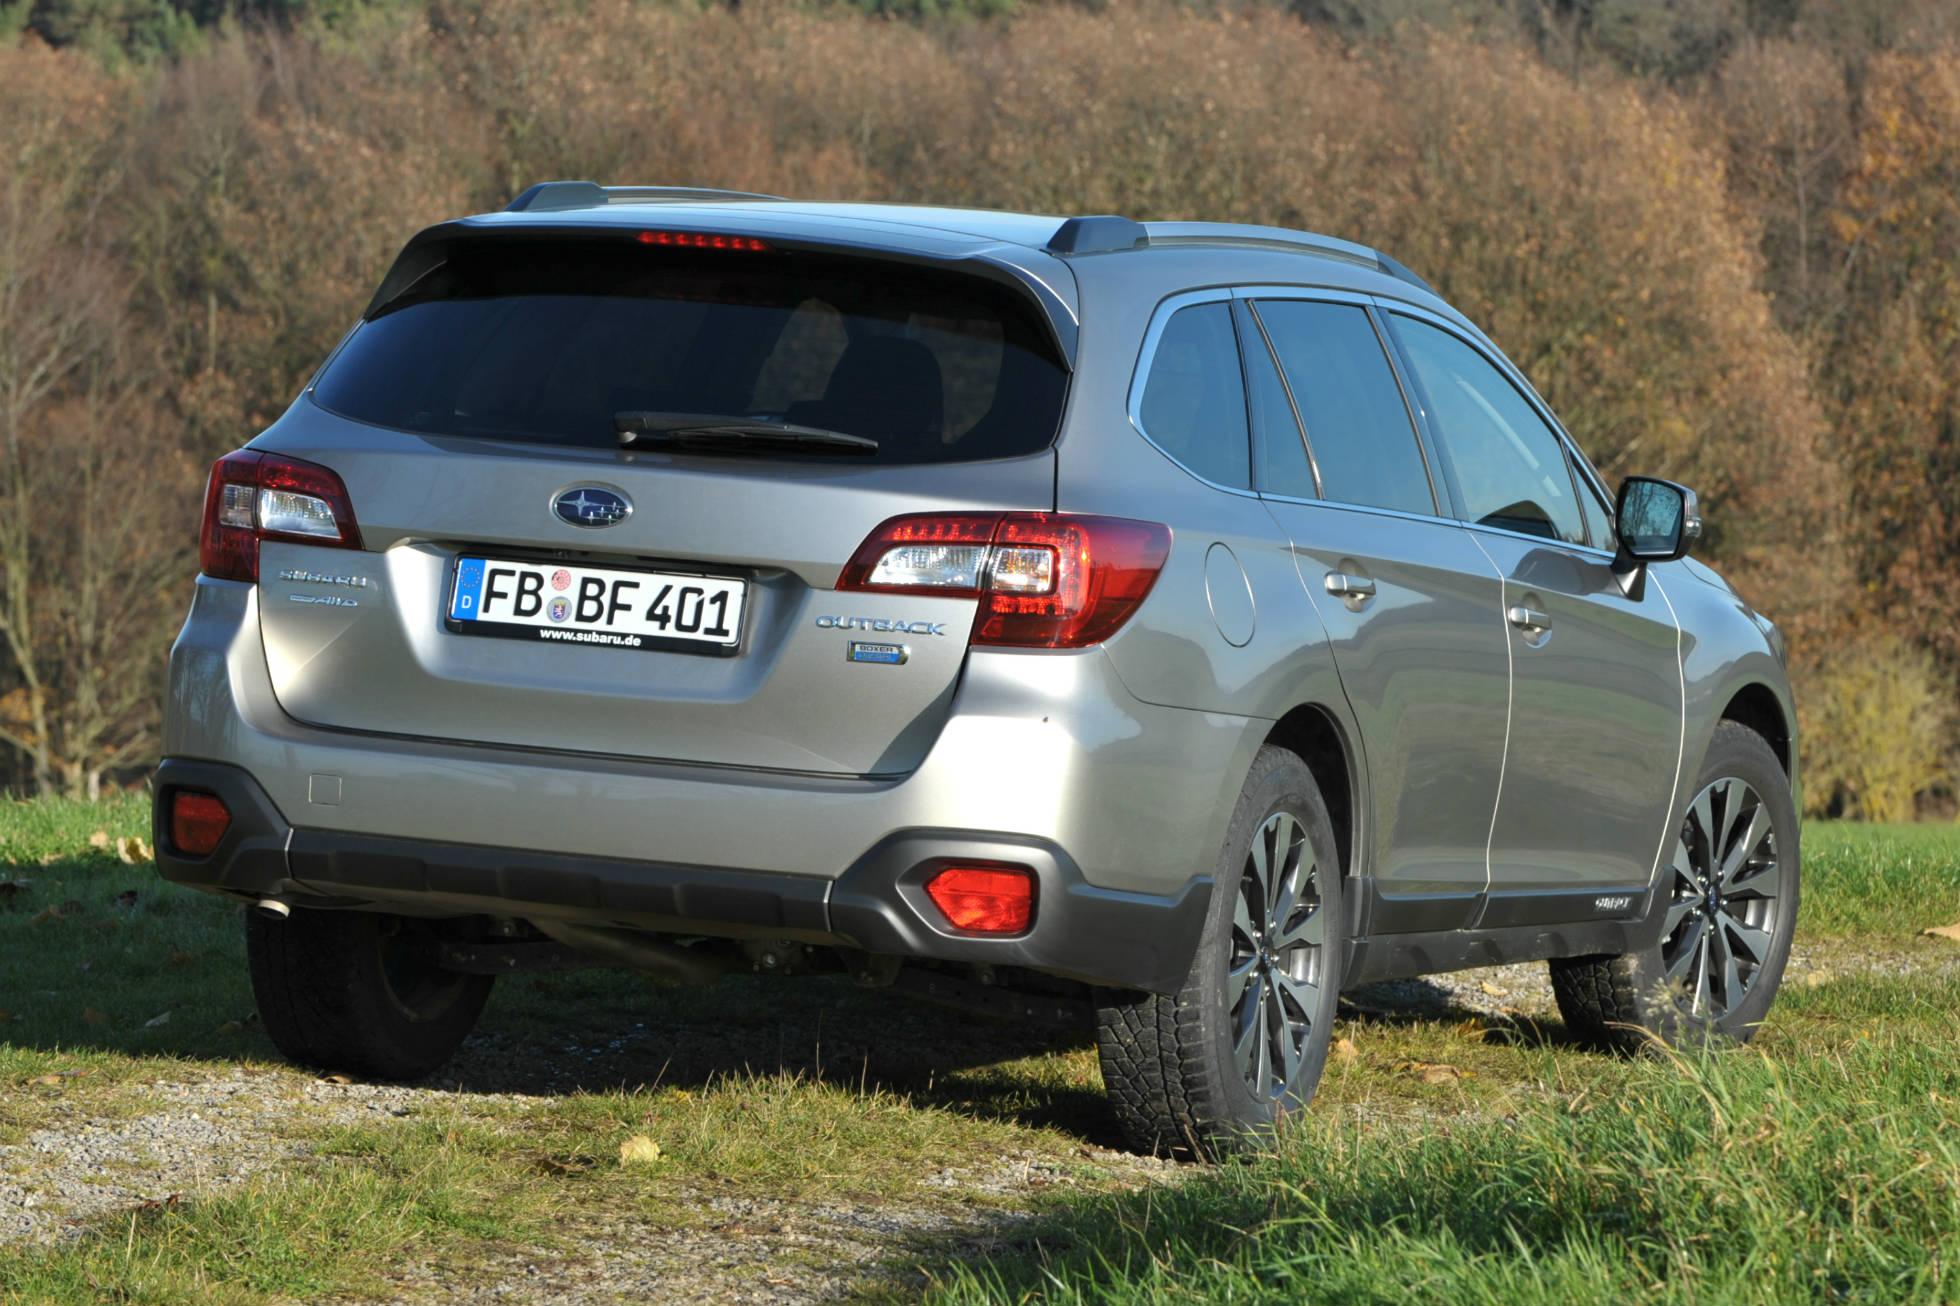 Verdict: 2015 Subaru Outback